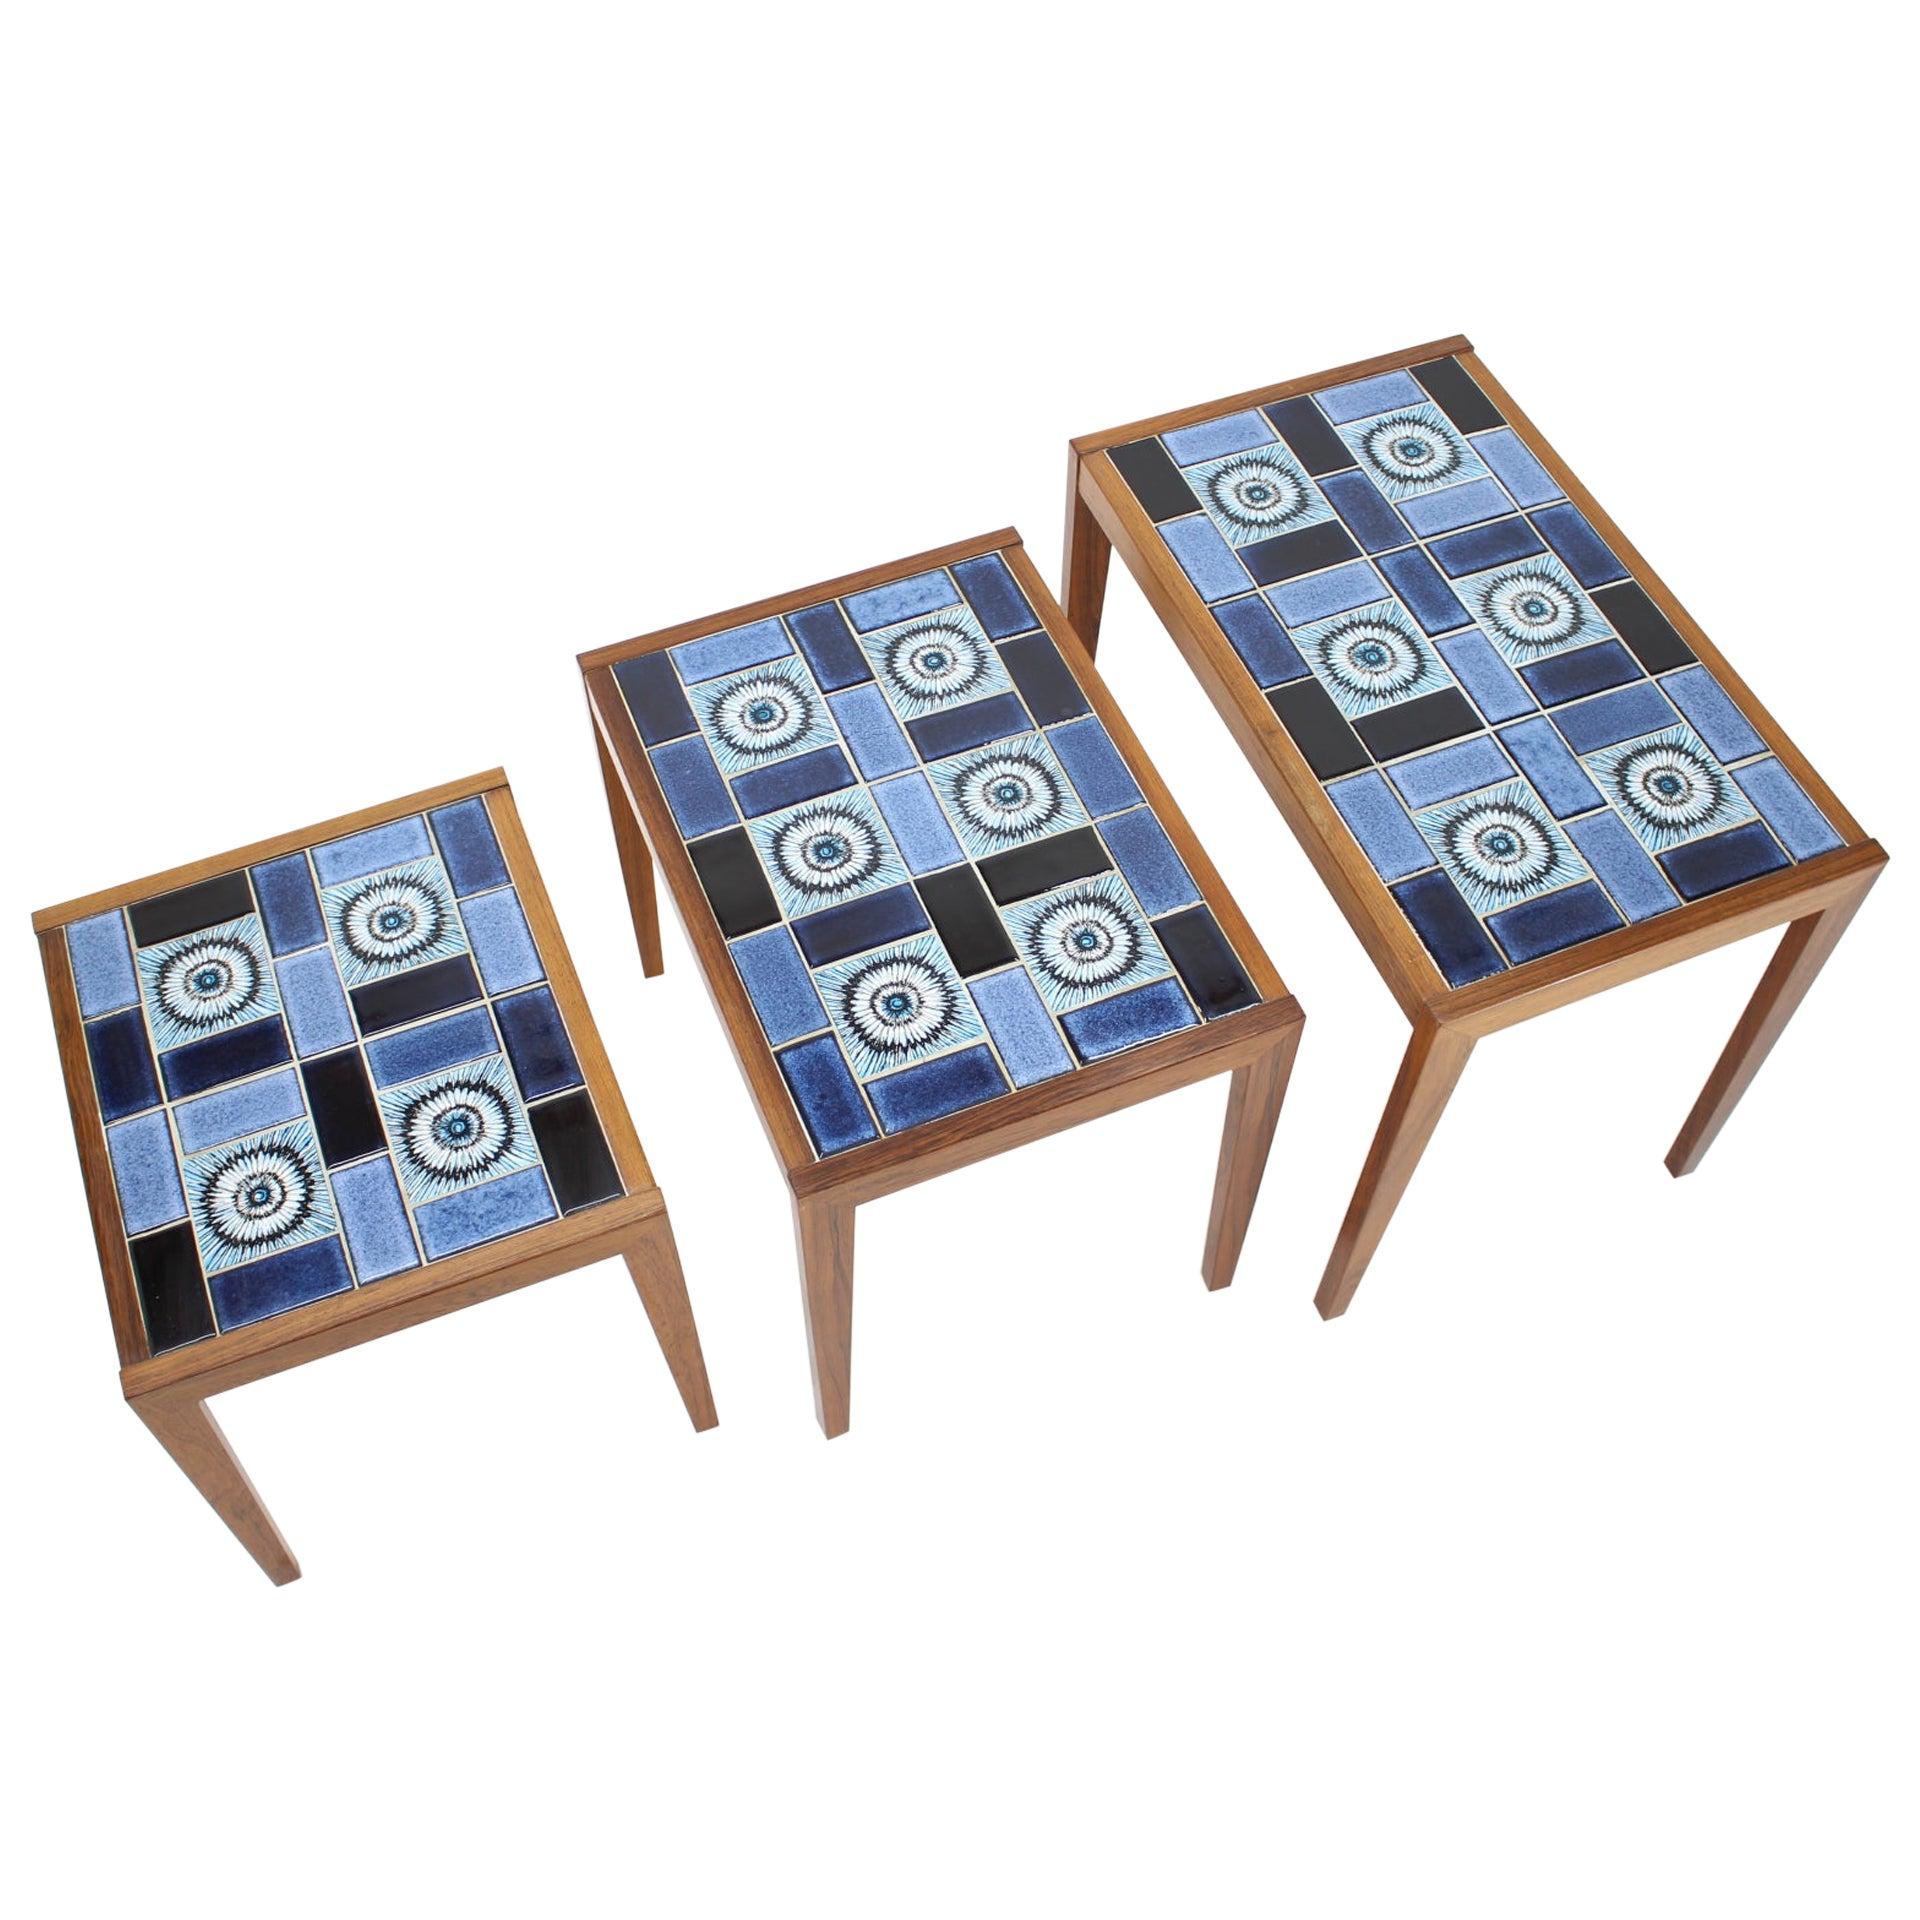 1960s Nesting Ceramic Tables, Denmark